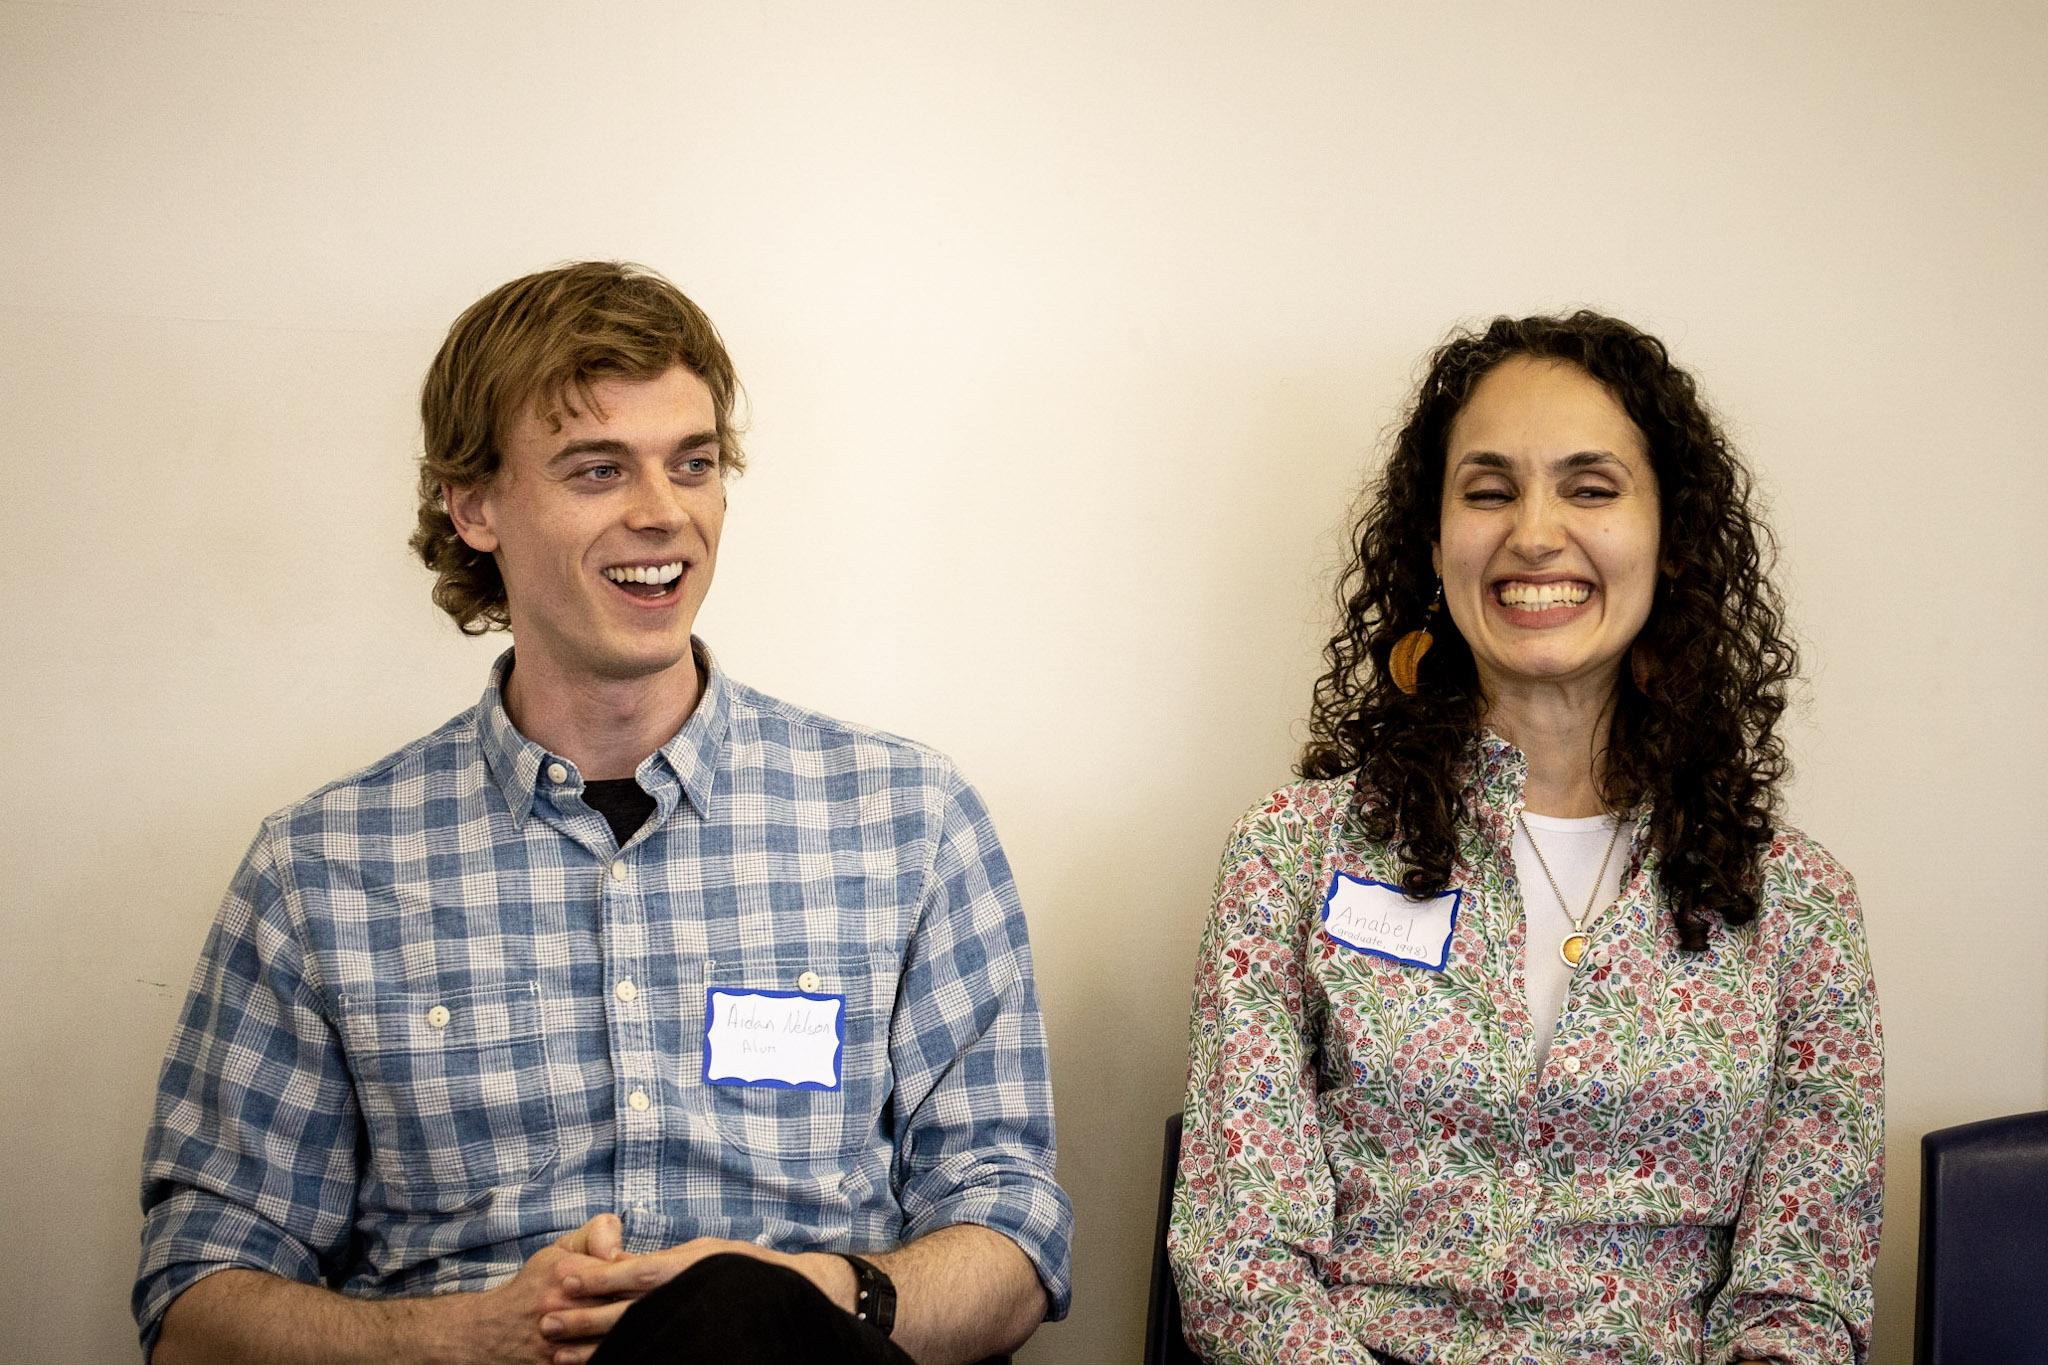 Aidan Nelson and Anabel Goa.